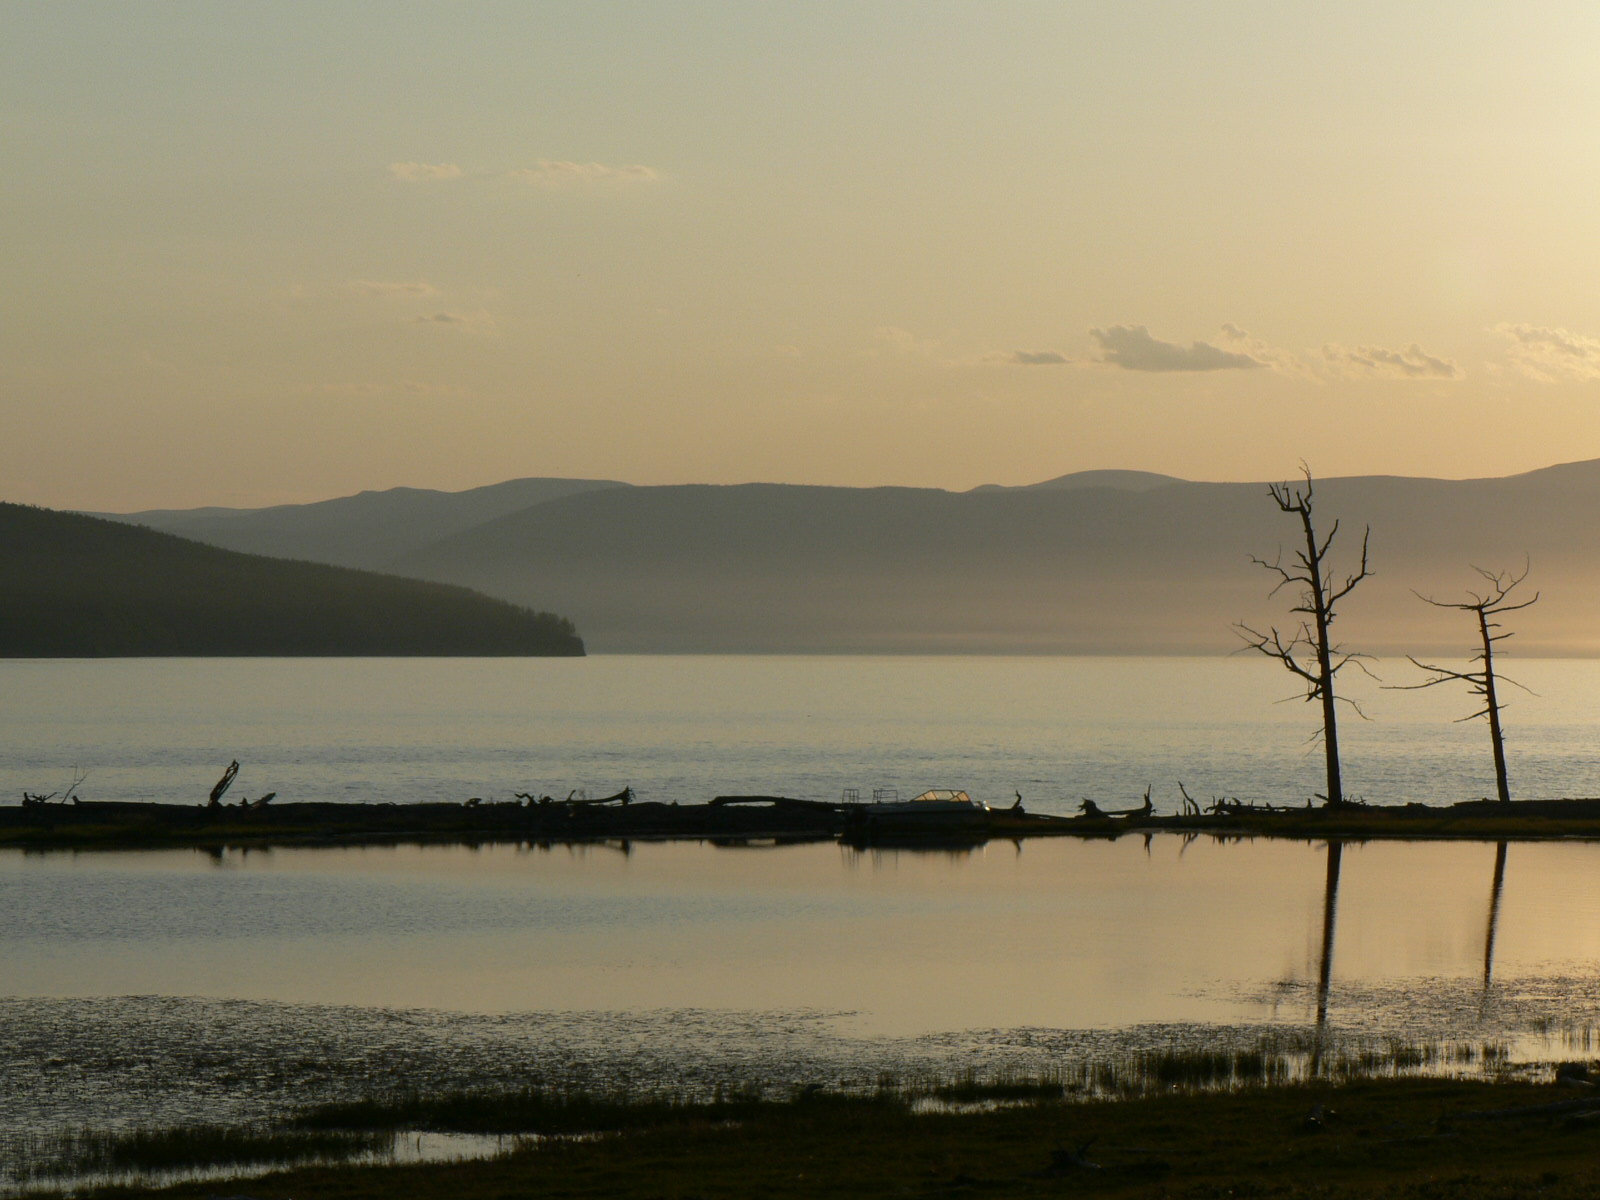 Le lac Khuvsgul